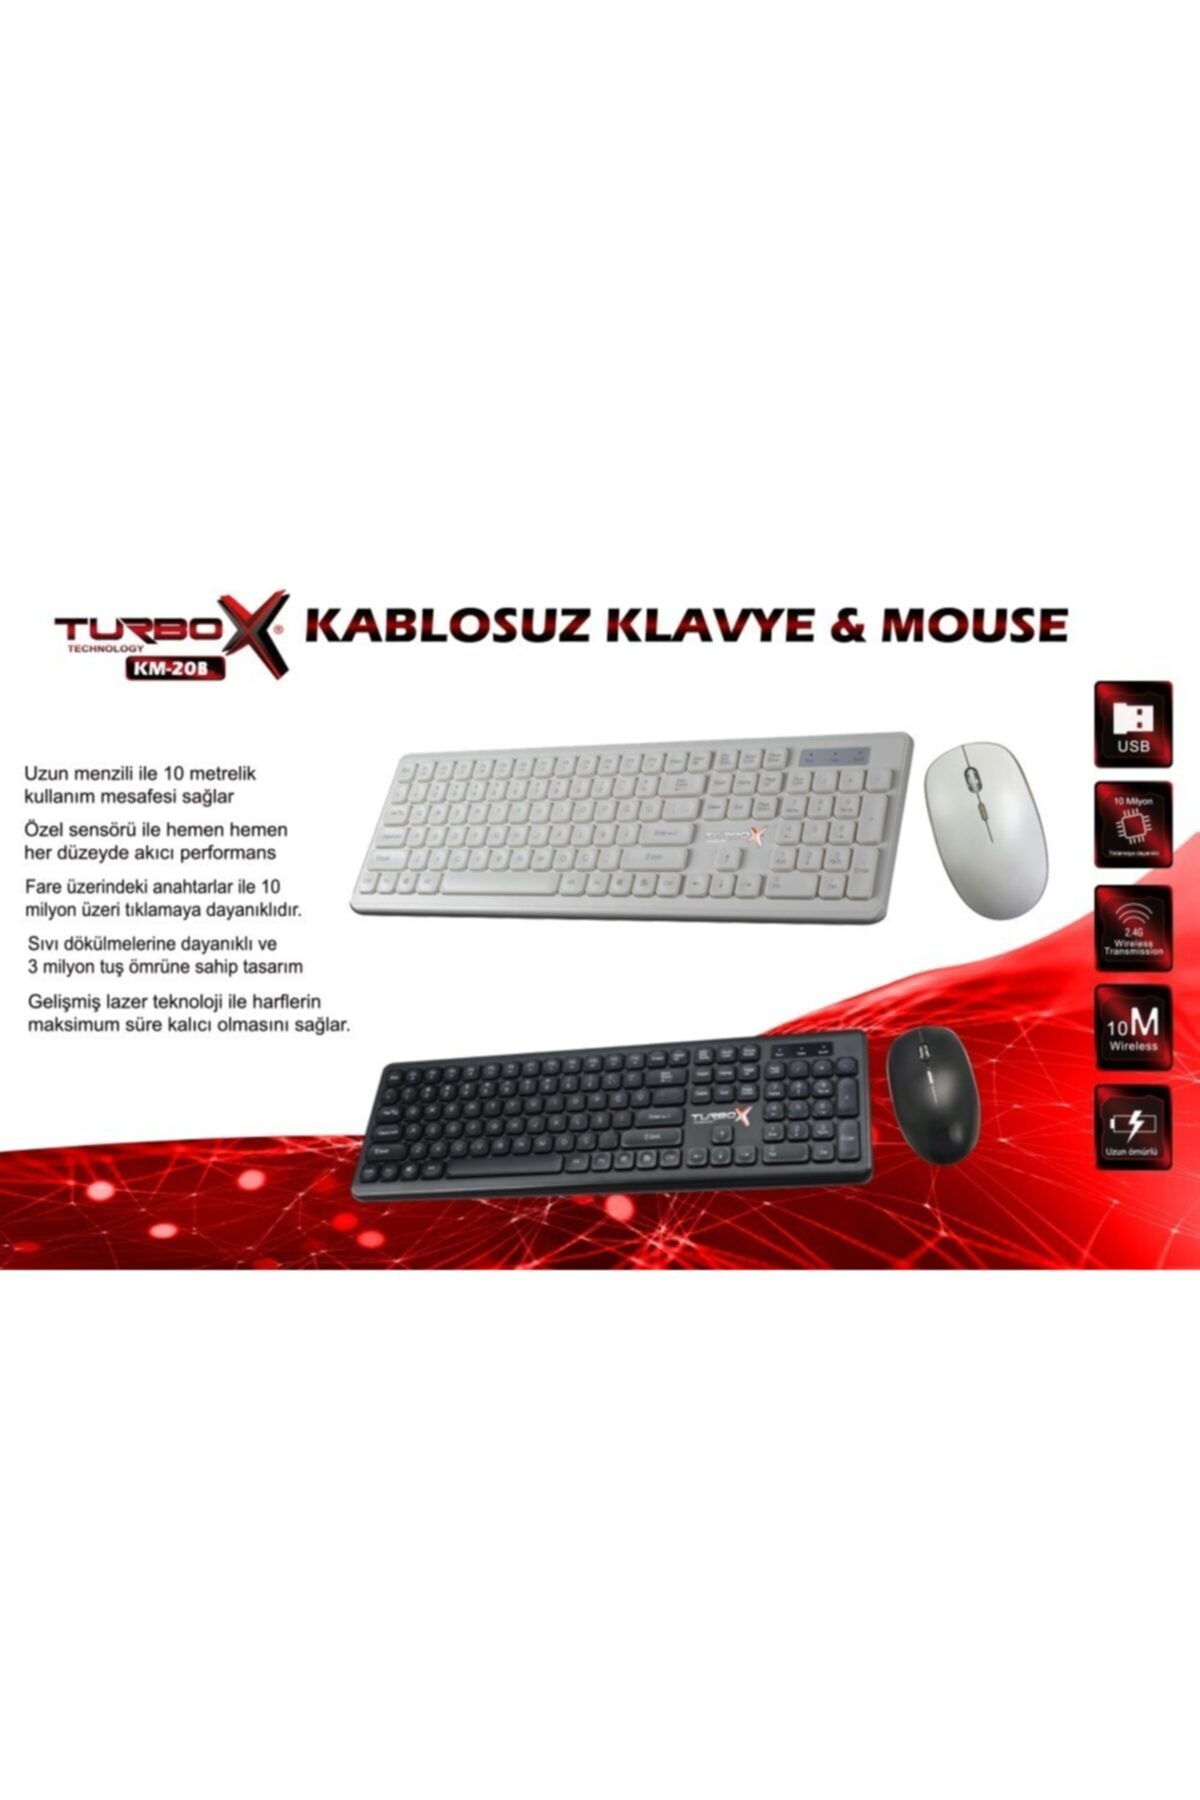 TURBOX Km-20 Black Wireless Multimedya Tr Q Klavye Mouse Set Siyah 2